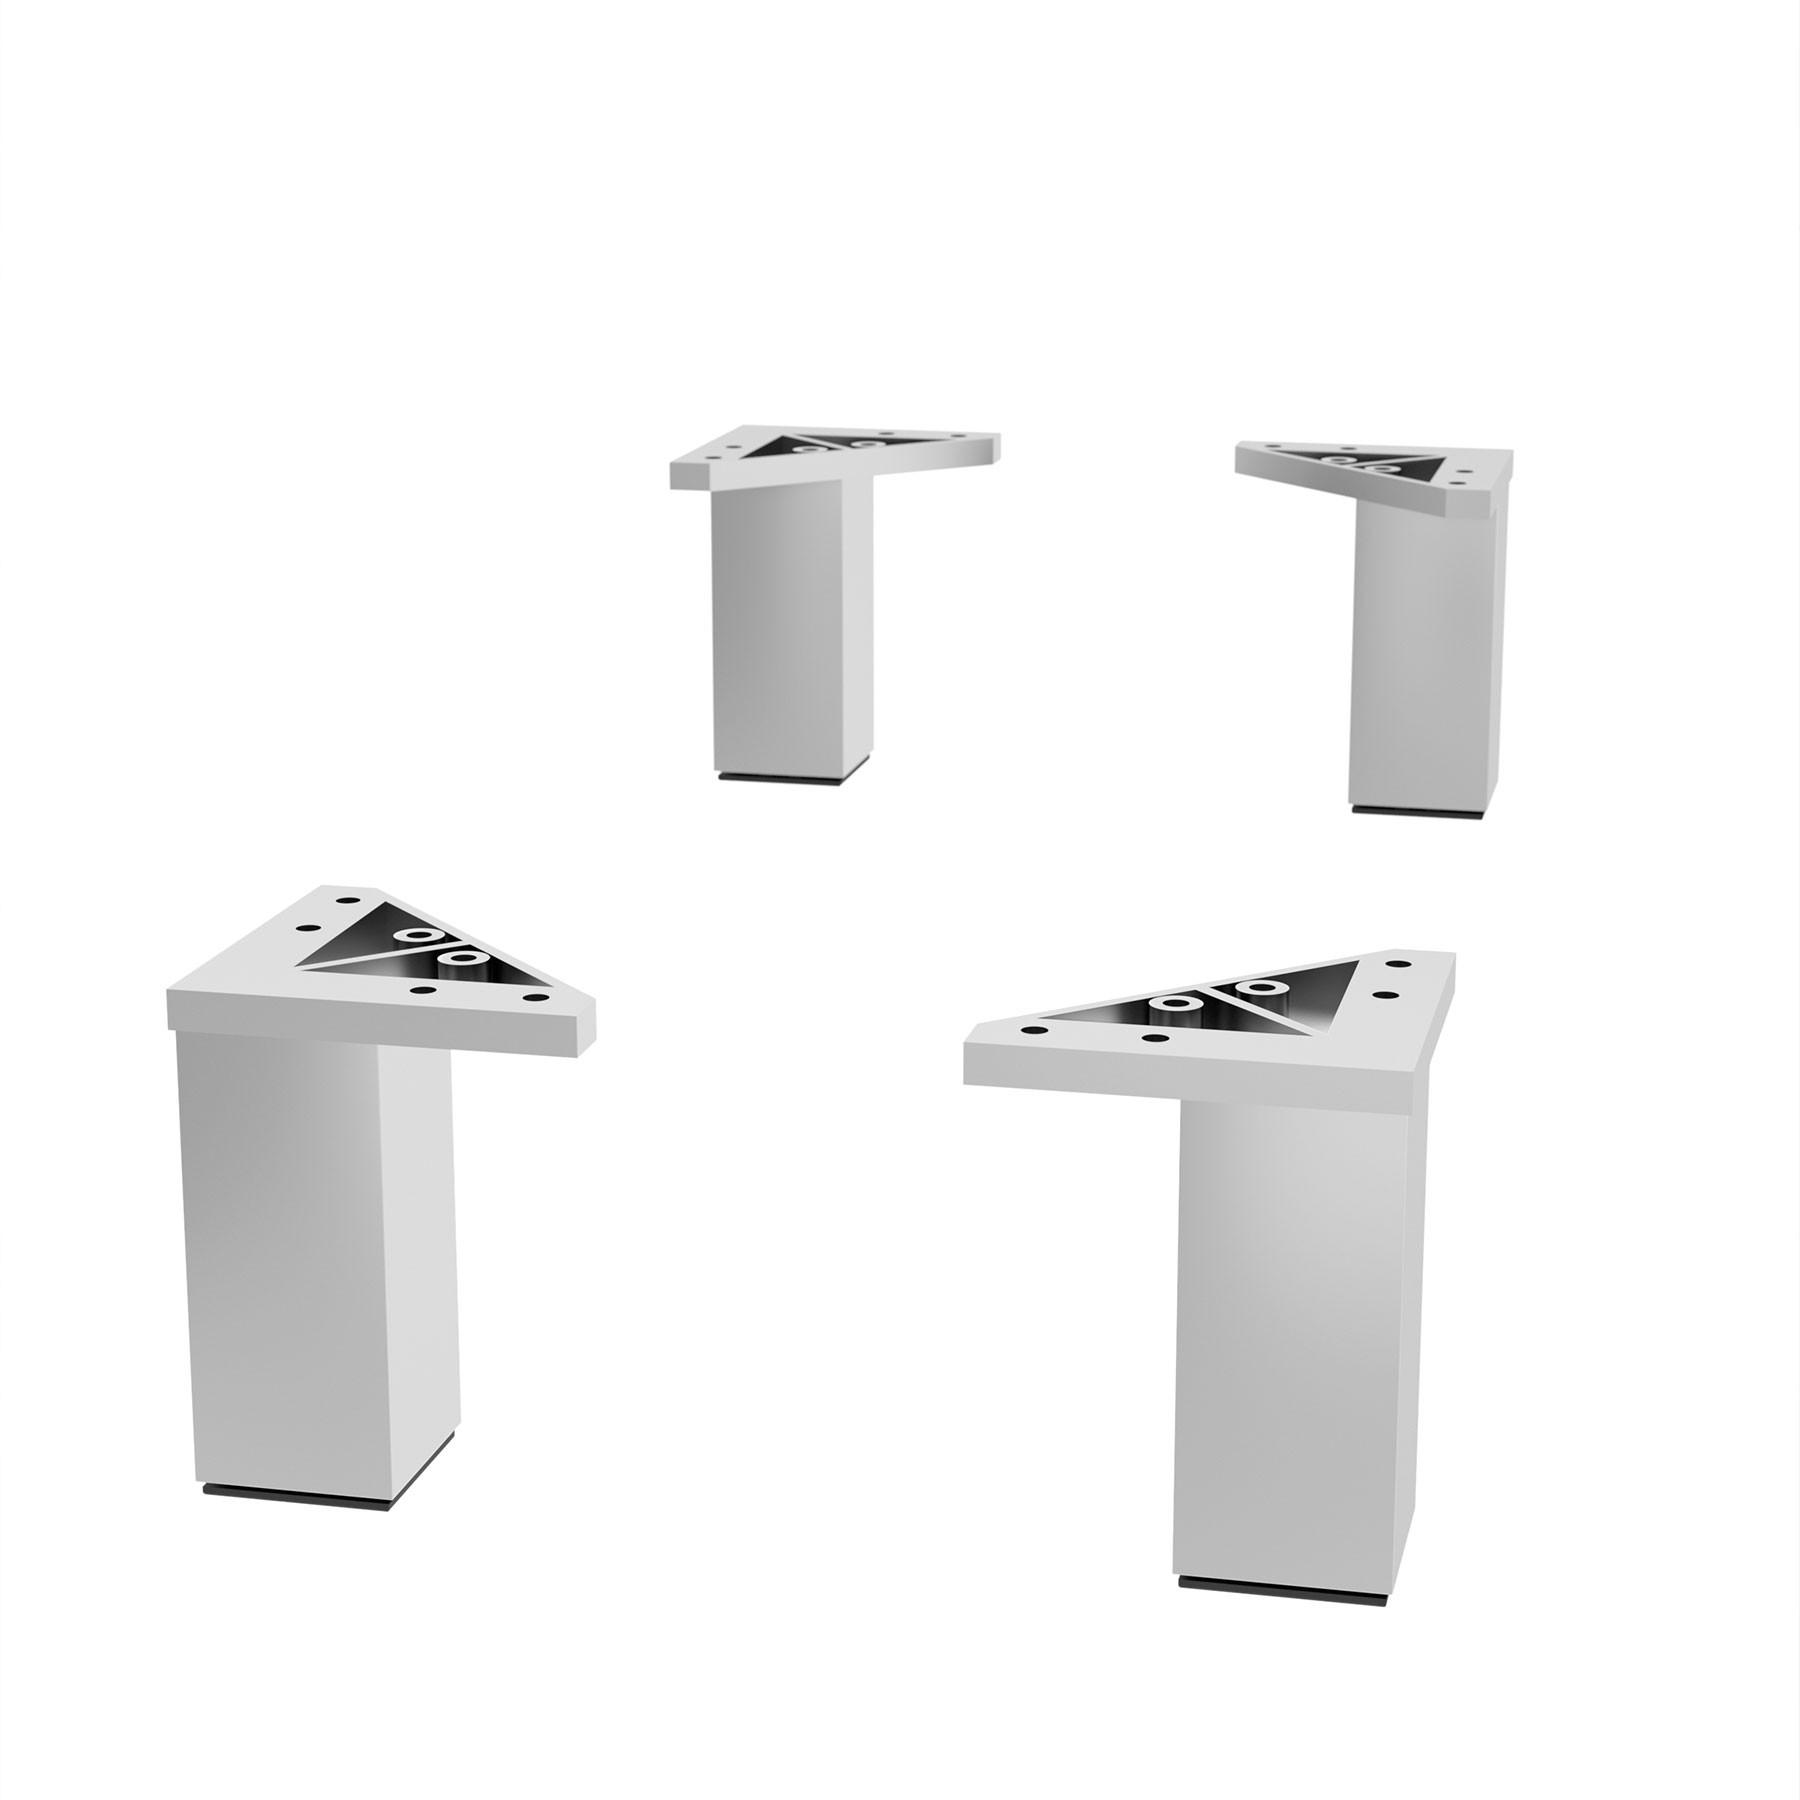 piedini per mobili + filtra. Set Of 4 Legs Gloss Chrome Height 100 Mm